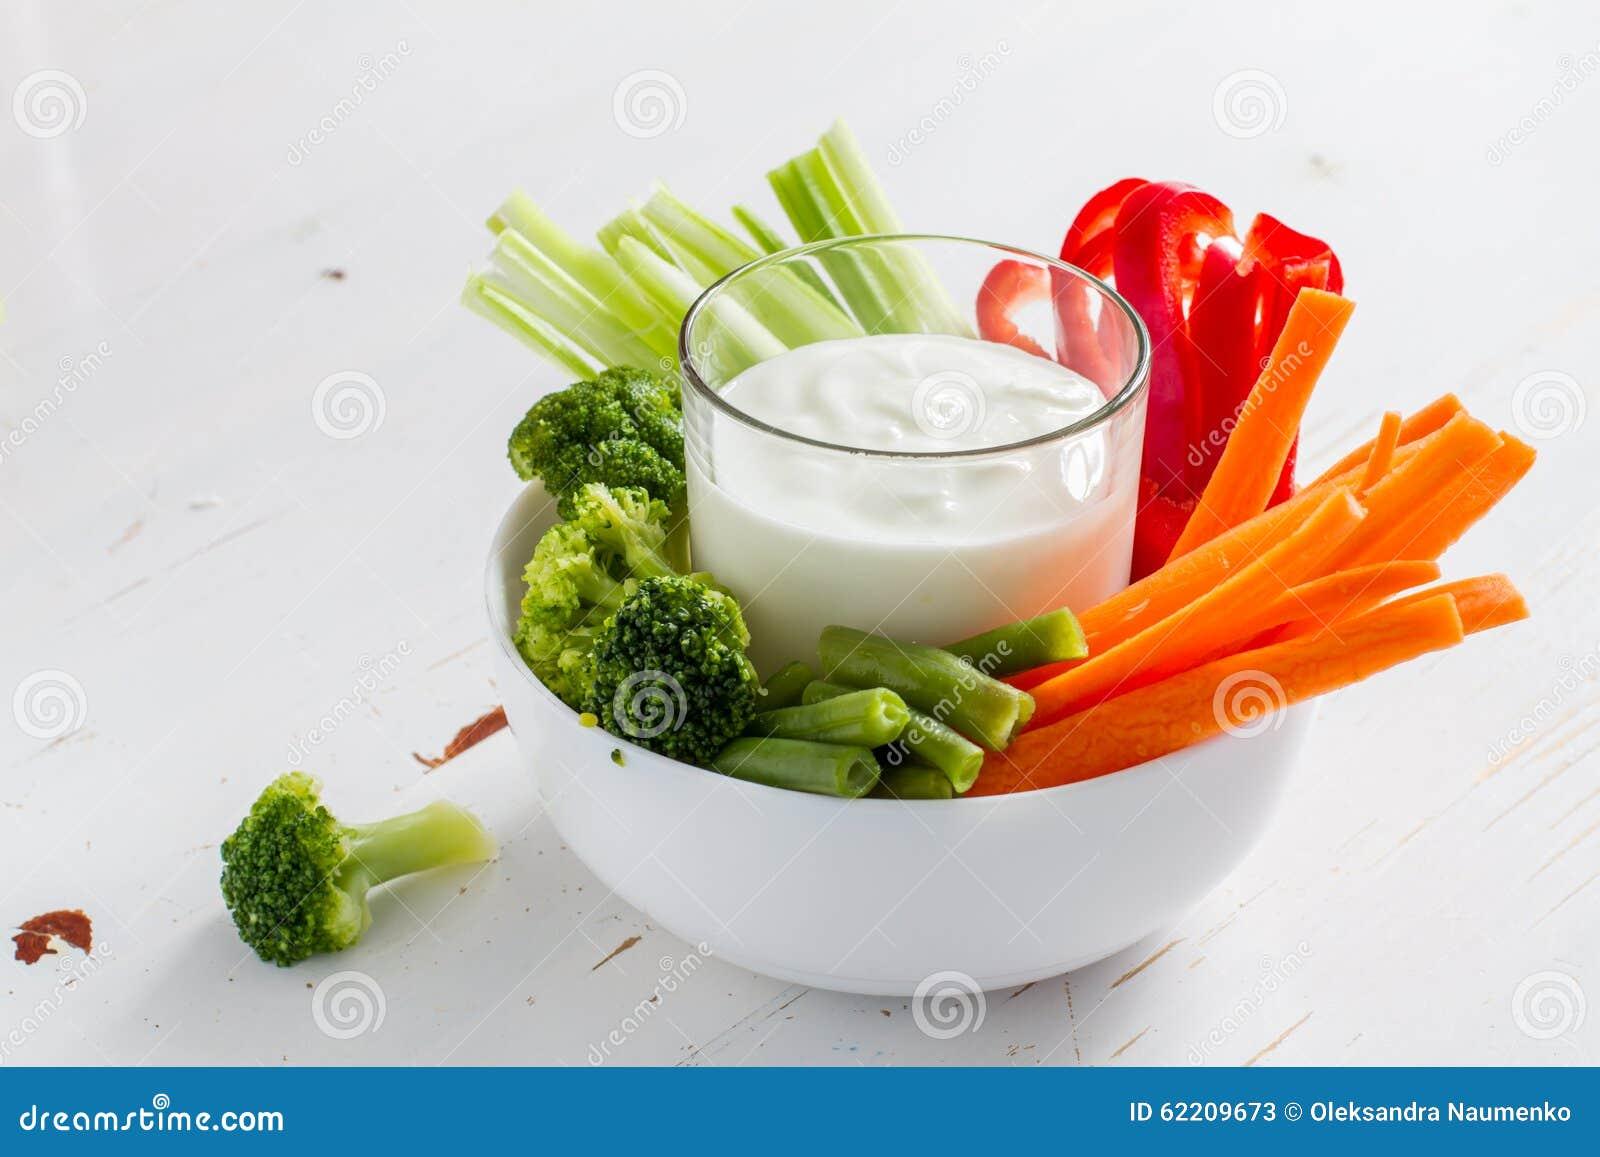 lebanese yogurt dip